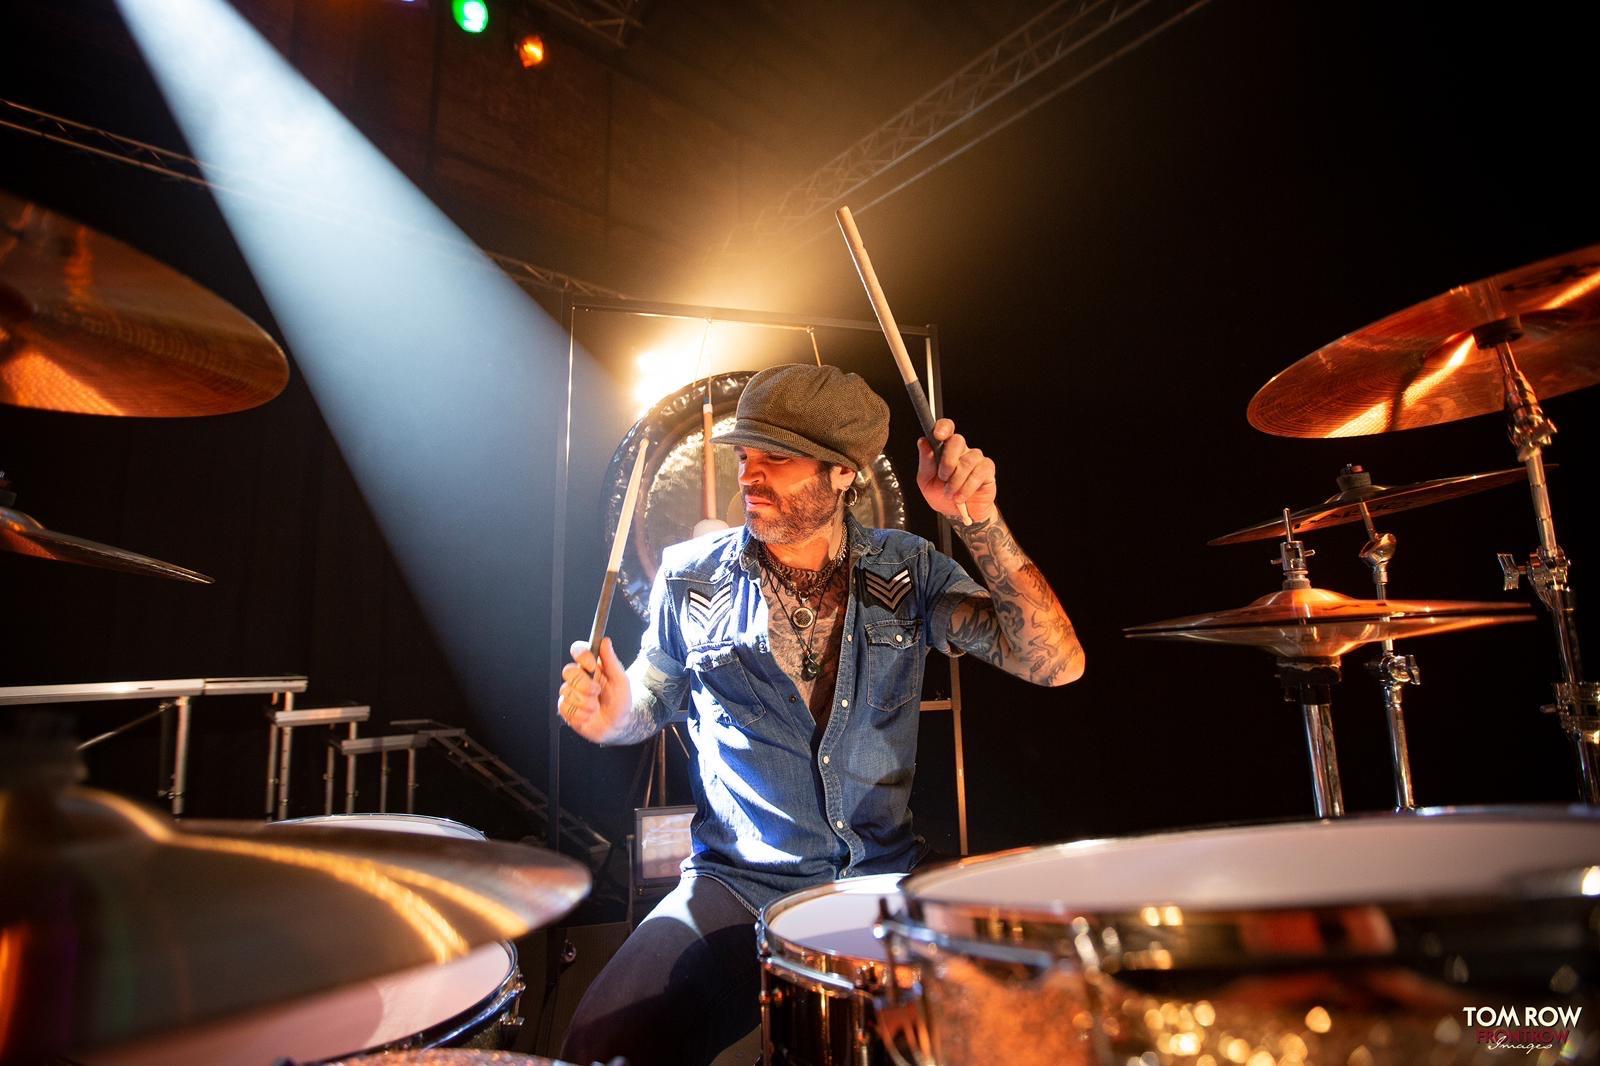 John Diva & the Rocket of Love Videodreh Drummer